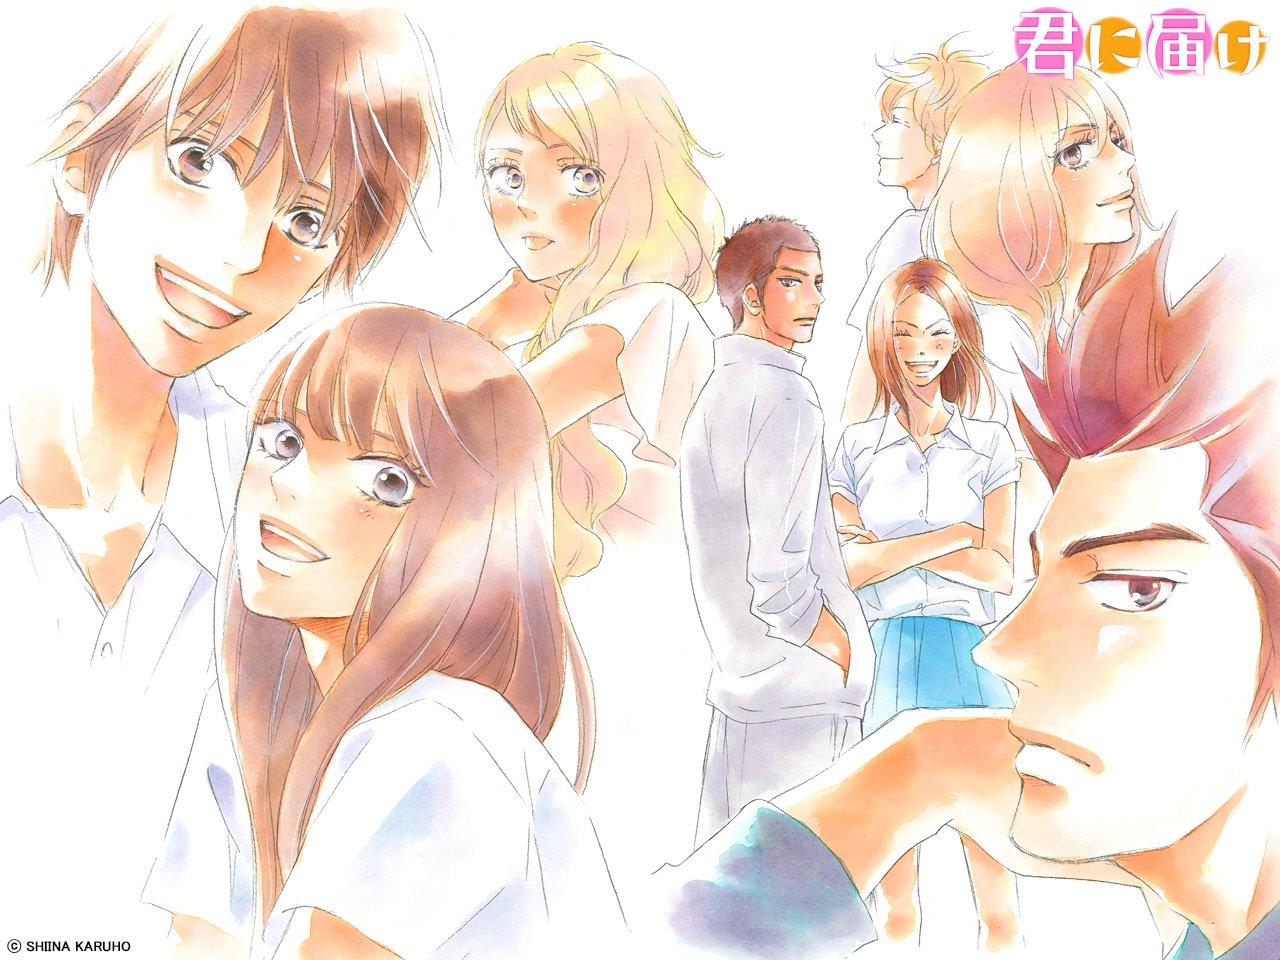 the very popular youth comic kimi ni todoke finally completes 君に届け0 - 大人気青春漫画「君に届け」がついに完結!